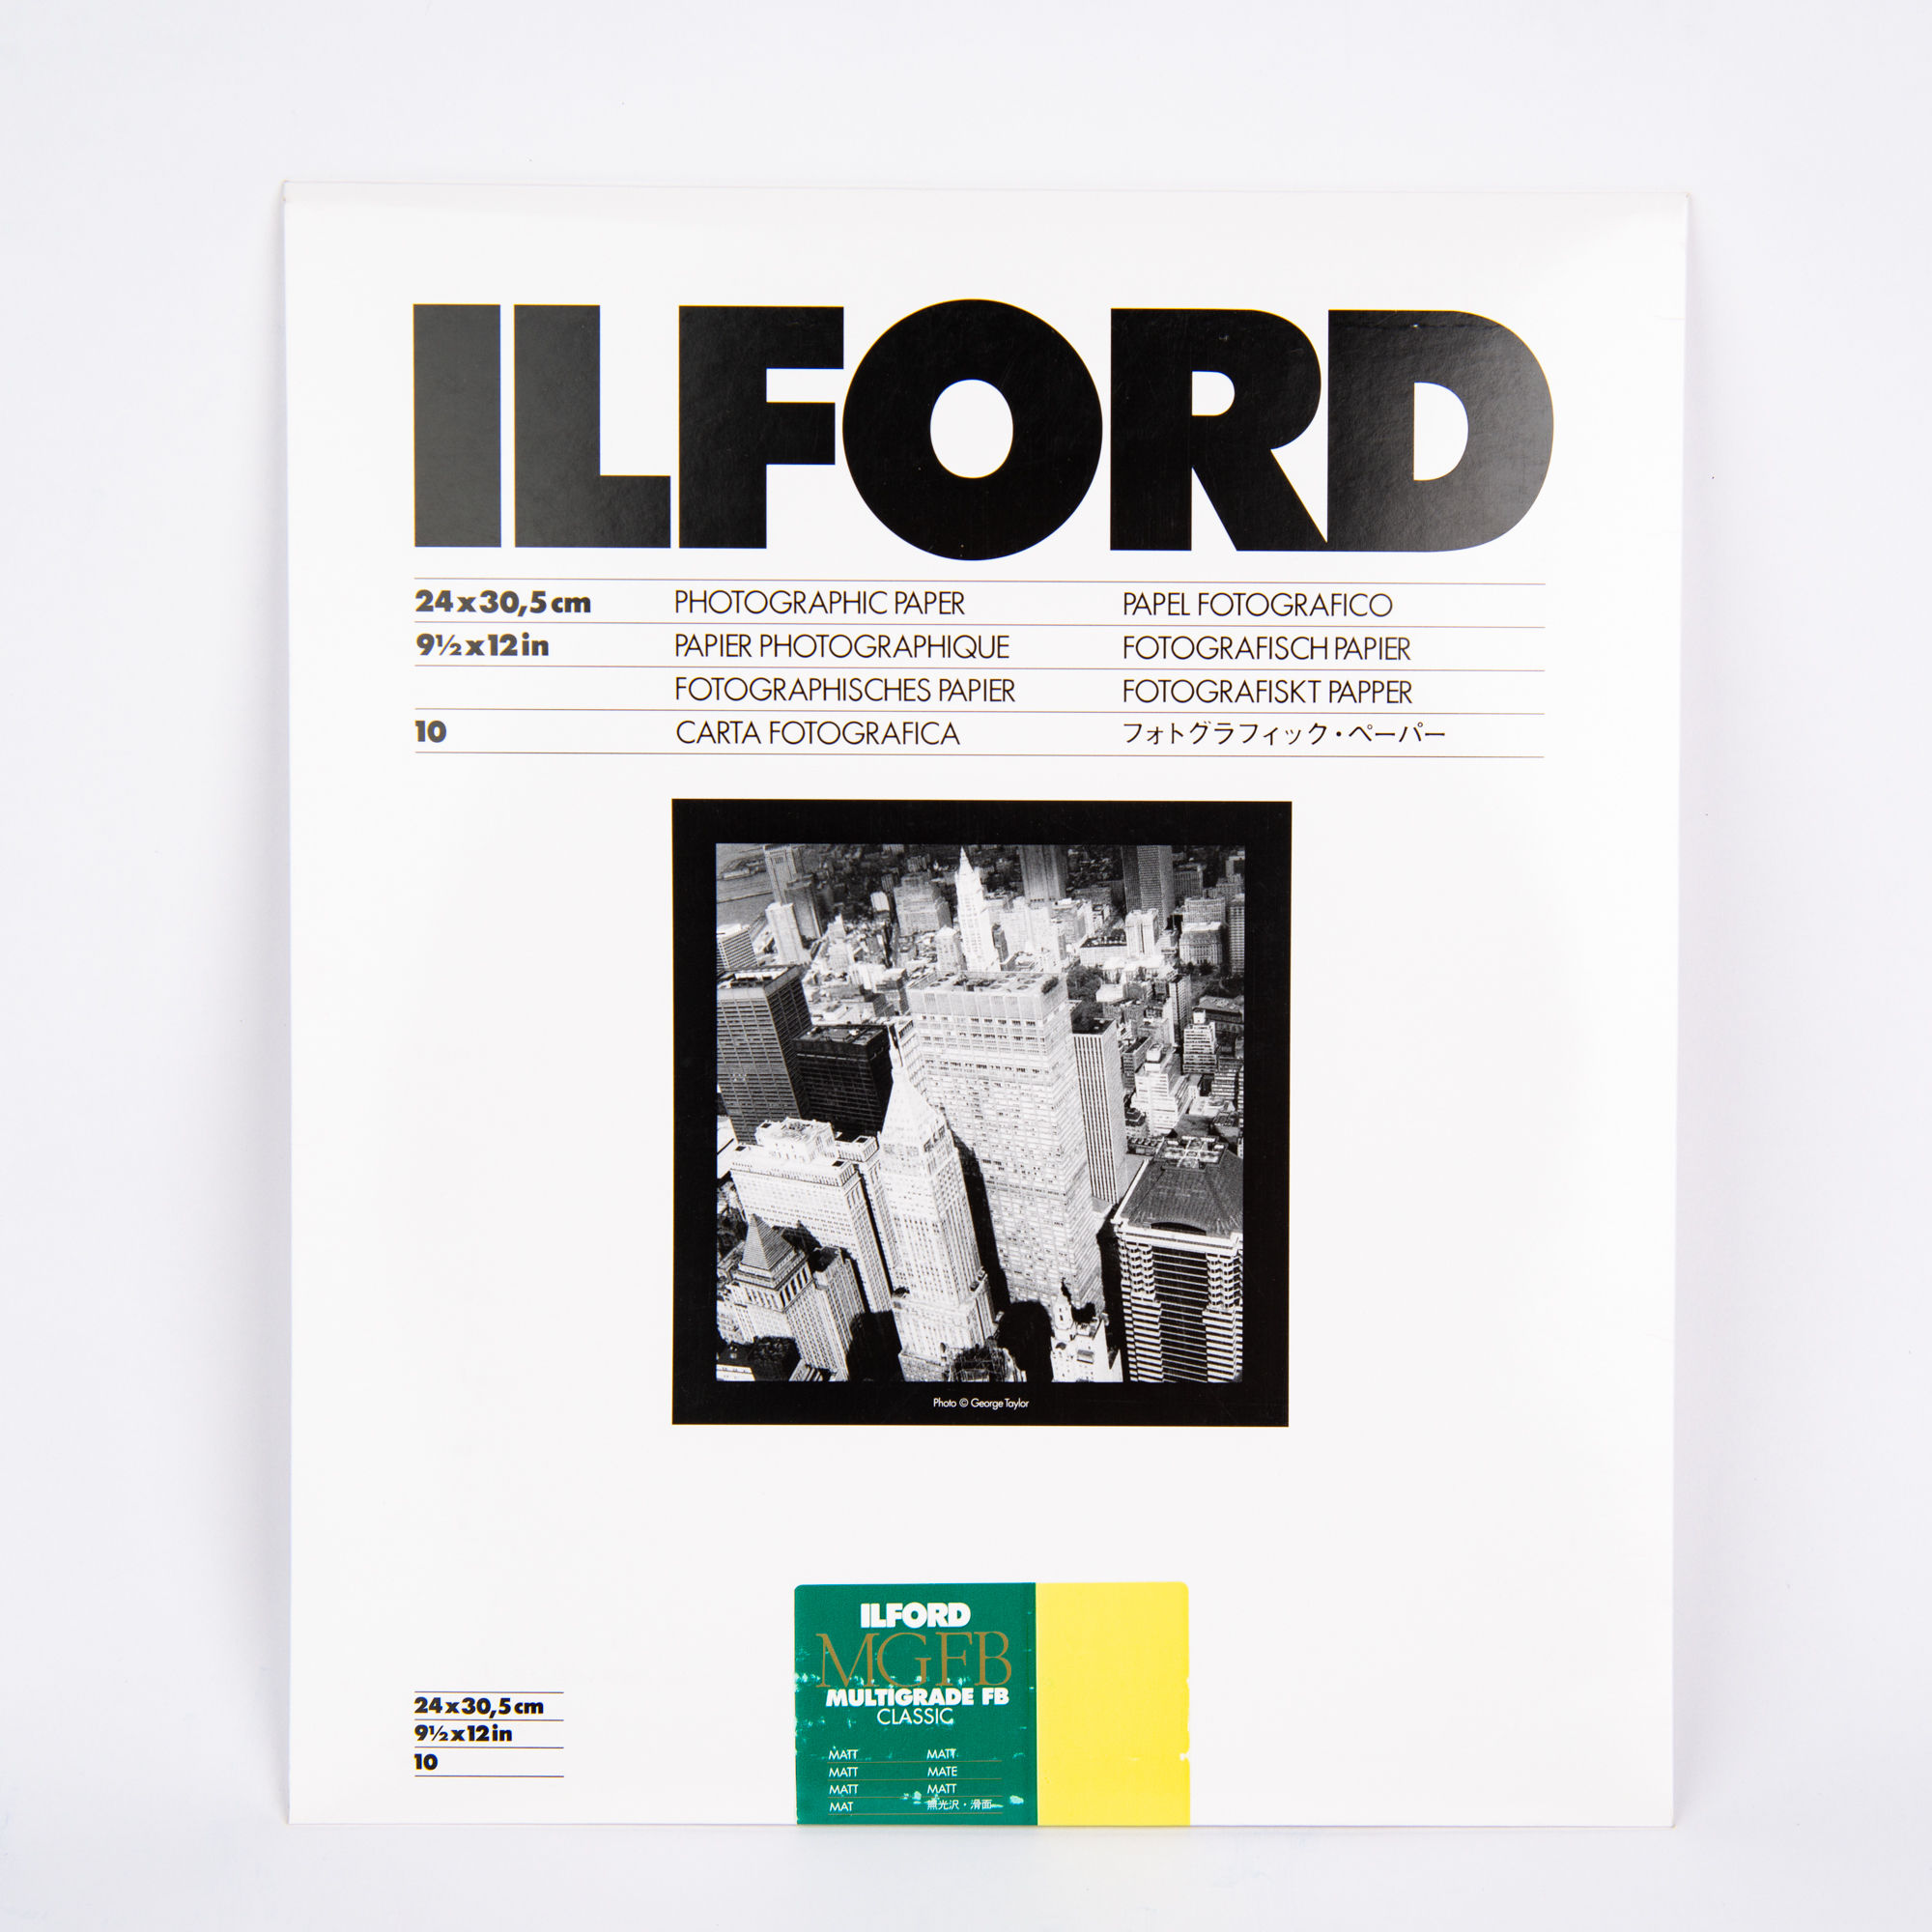 Фотобумага Ilford MG баритовая, 24 x 30,5 см, глянцевая, 10 листов